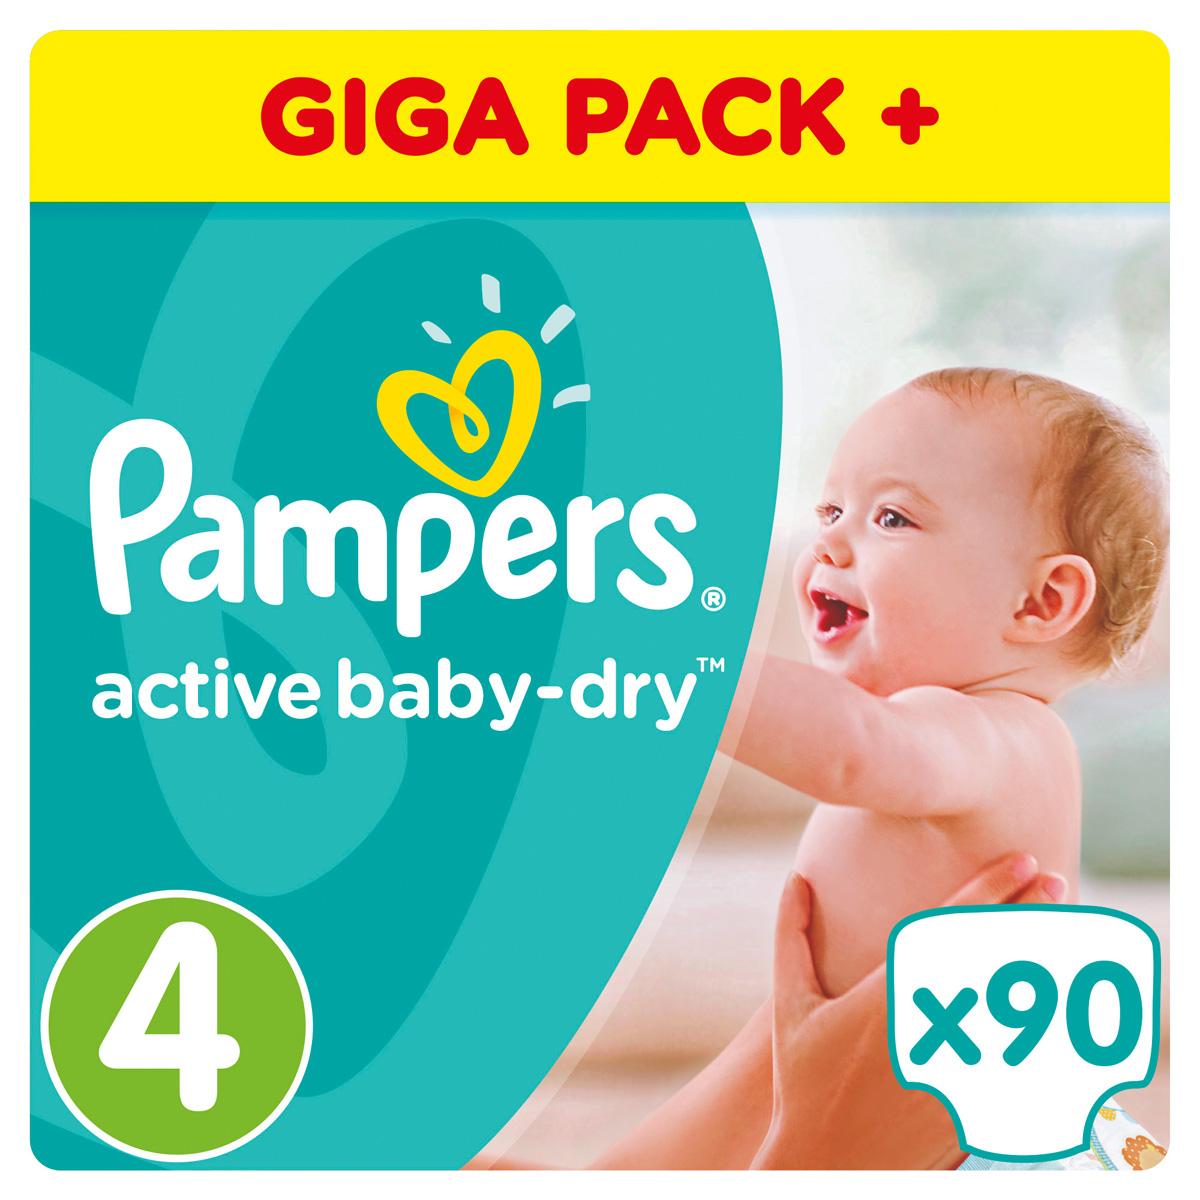 Pampers Active Baby Подгузники Dry 4 (8-14 кг) 90 шт подгузники pampers active baby dry размер 4 maxi 7 14 кг 90 шт